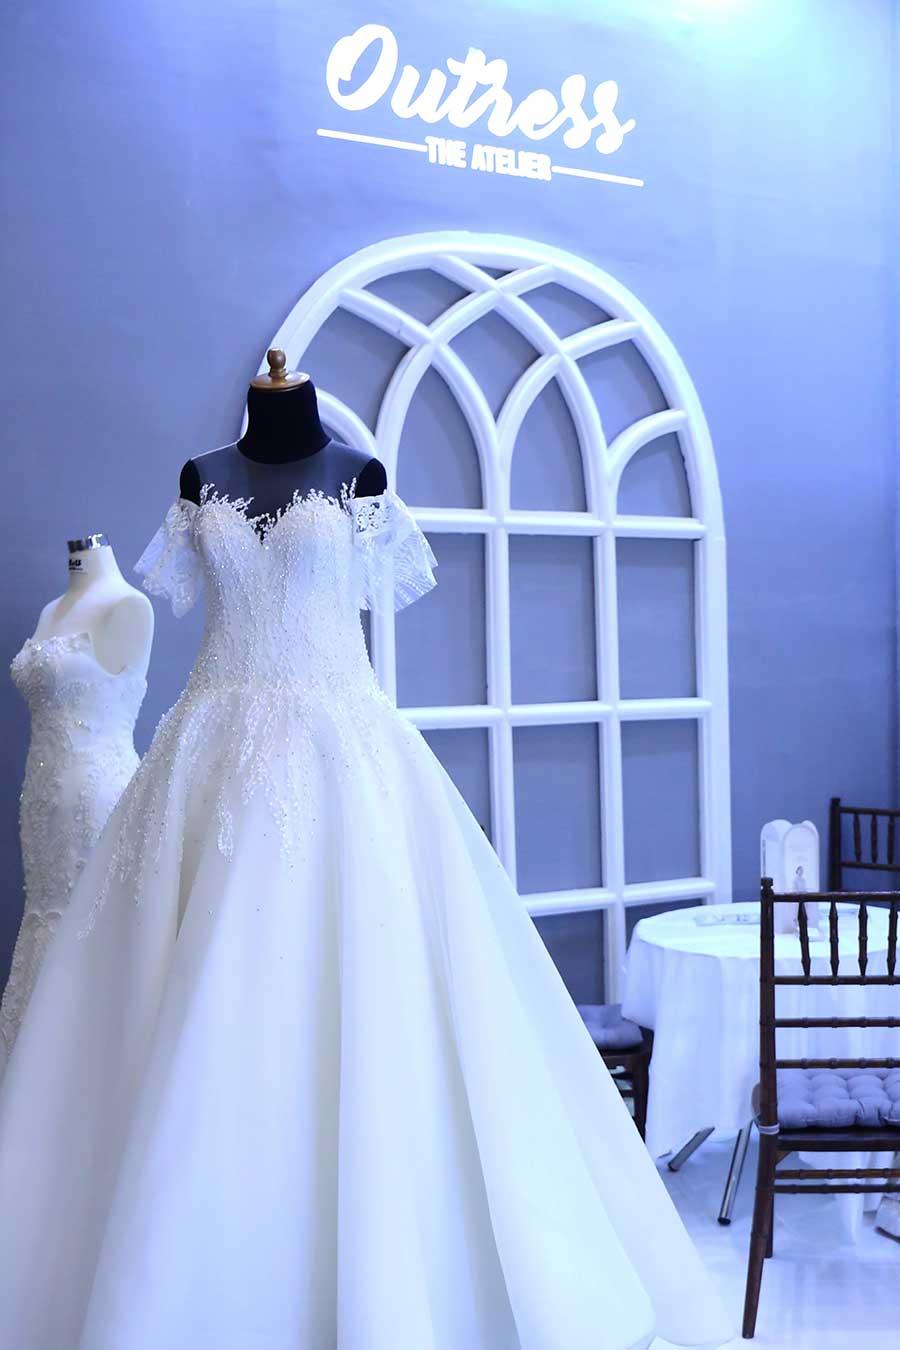 Bridestory Market